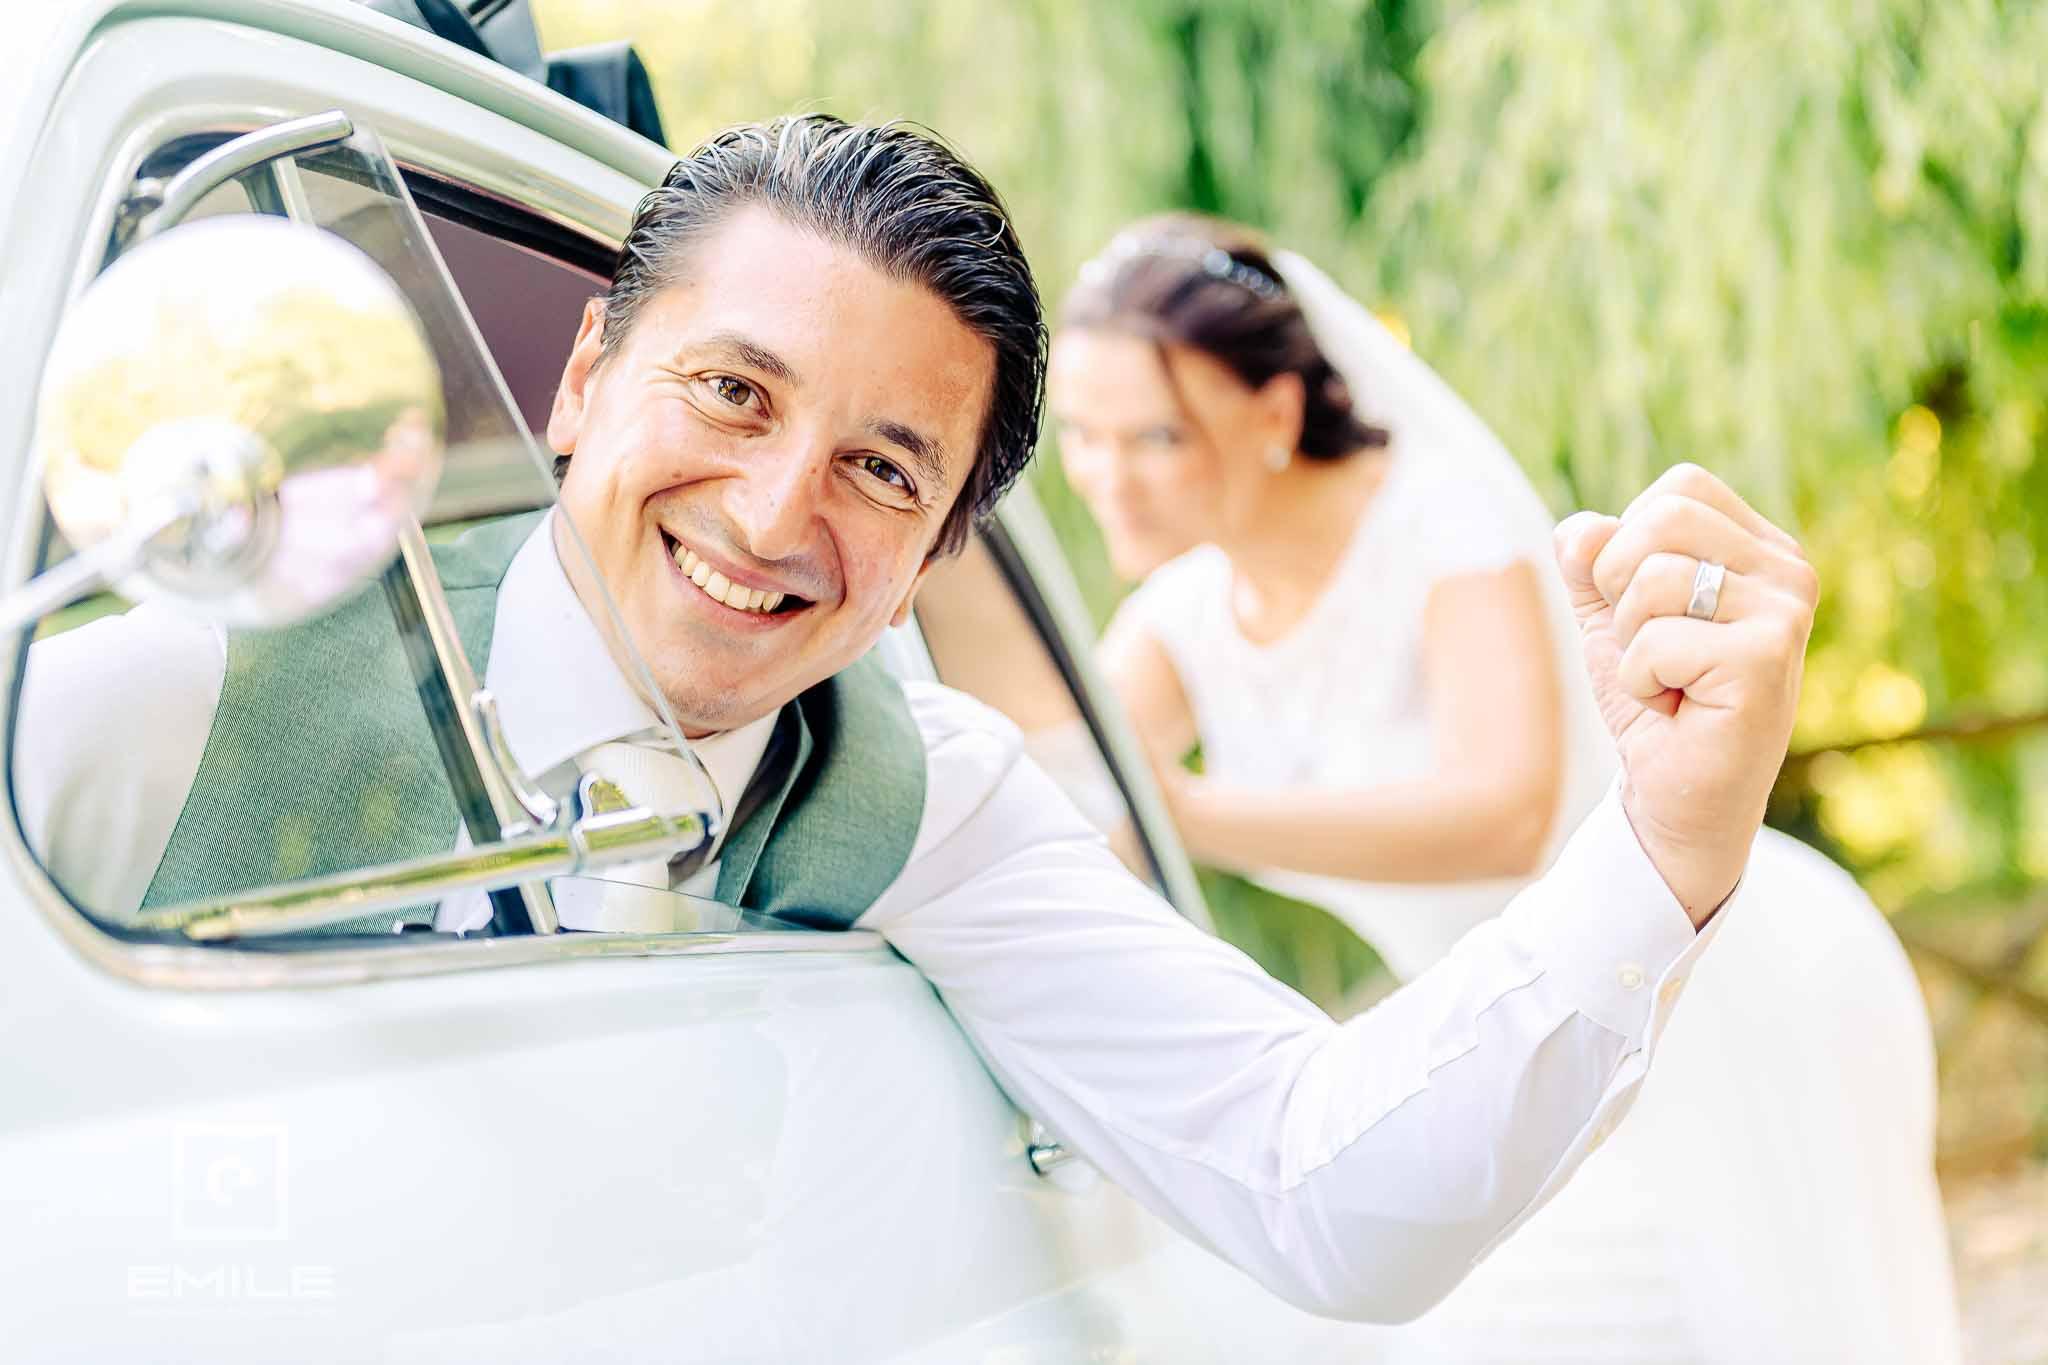 Bruidegom is blij dat bruid FIAT 500 duwt - Destination wedding San Gimignano - Toscane Italie - Iris en Job